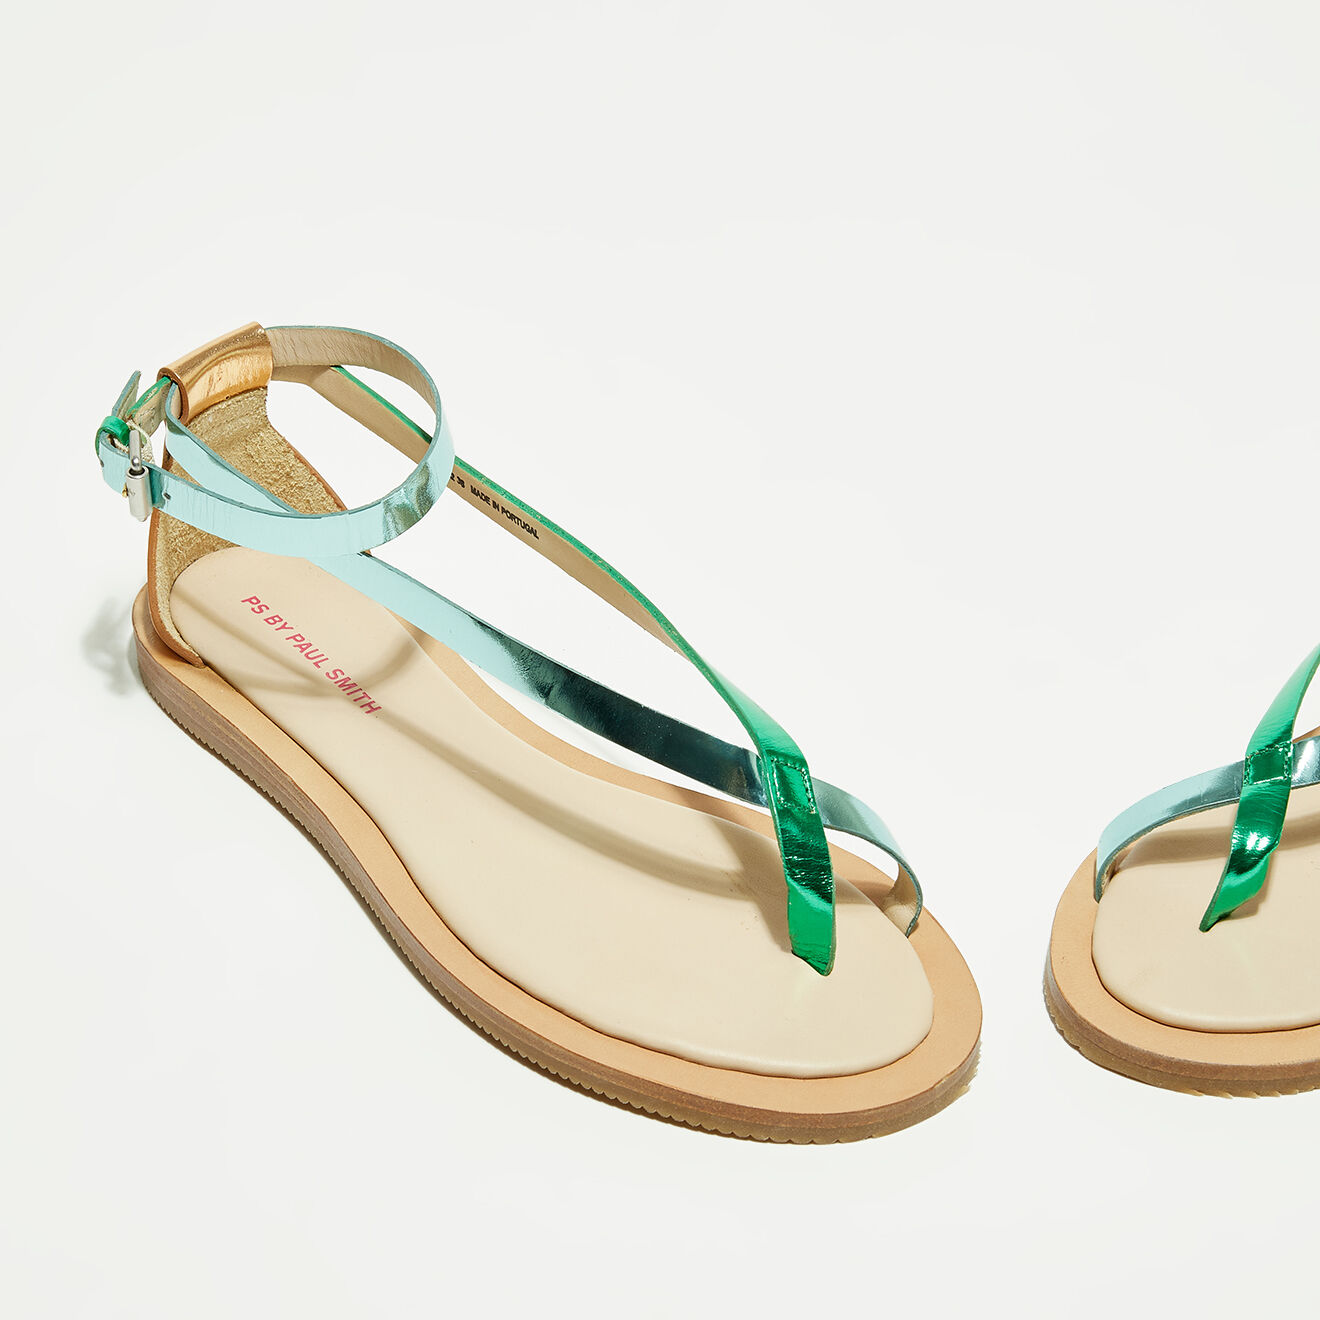 Sandales en Cuir Lilja vertes - Paul Smith - Modalova